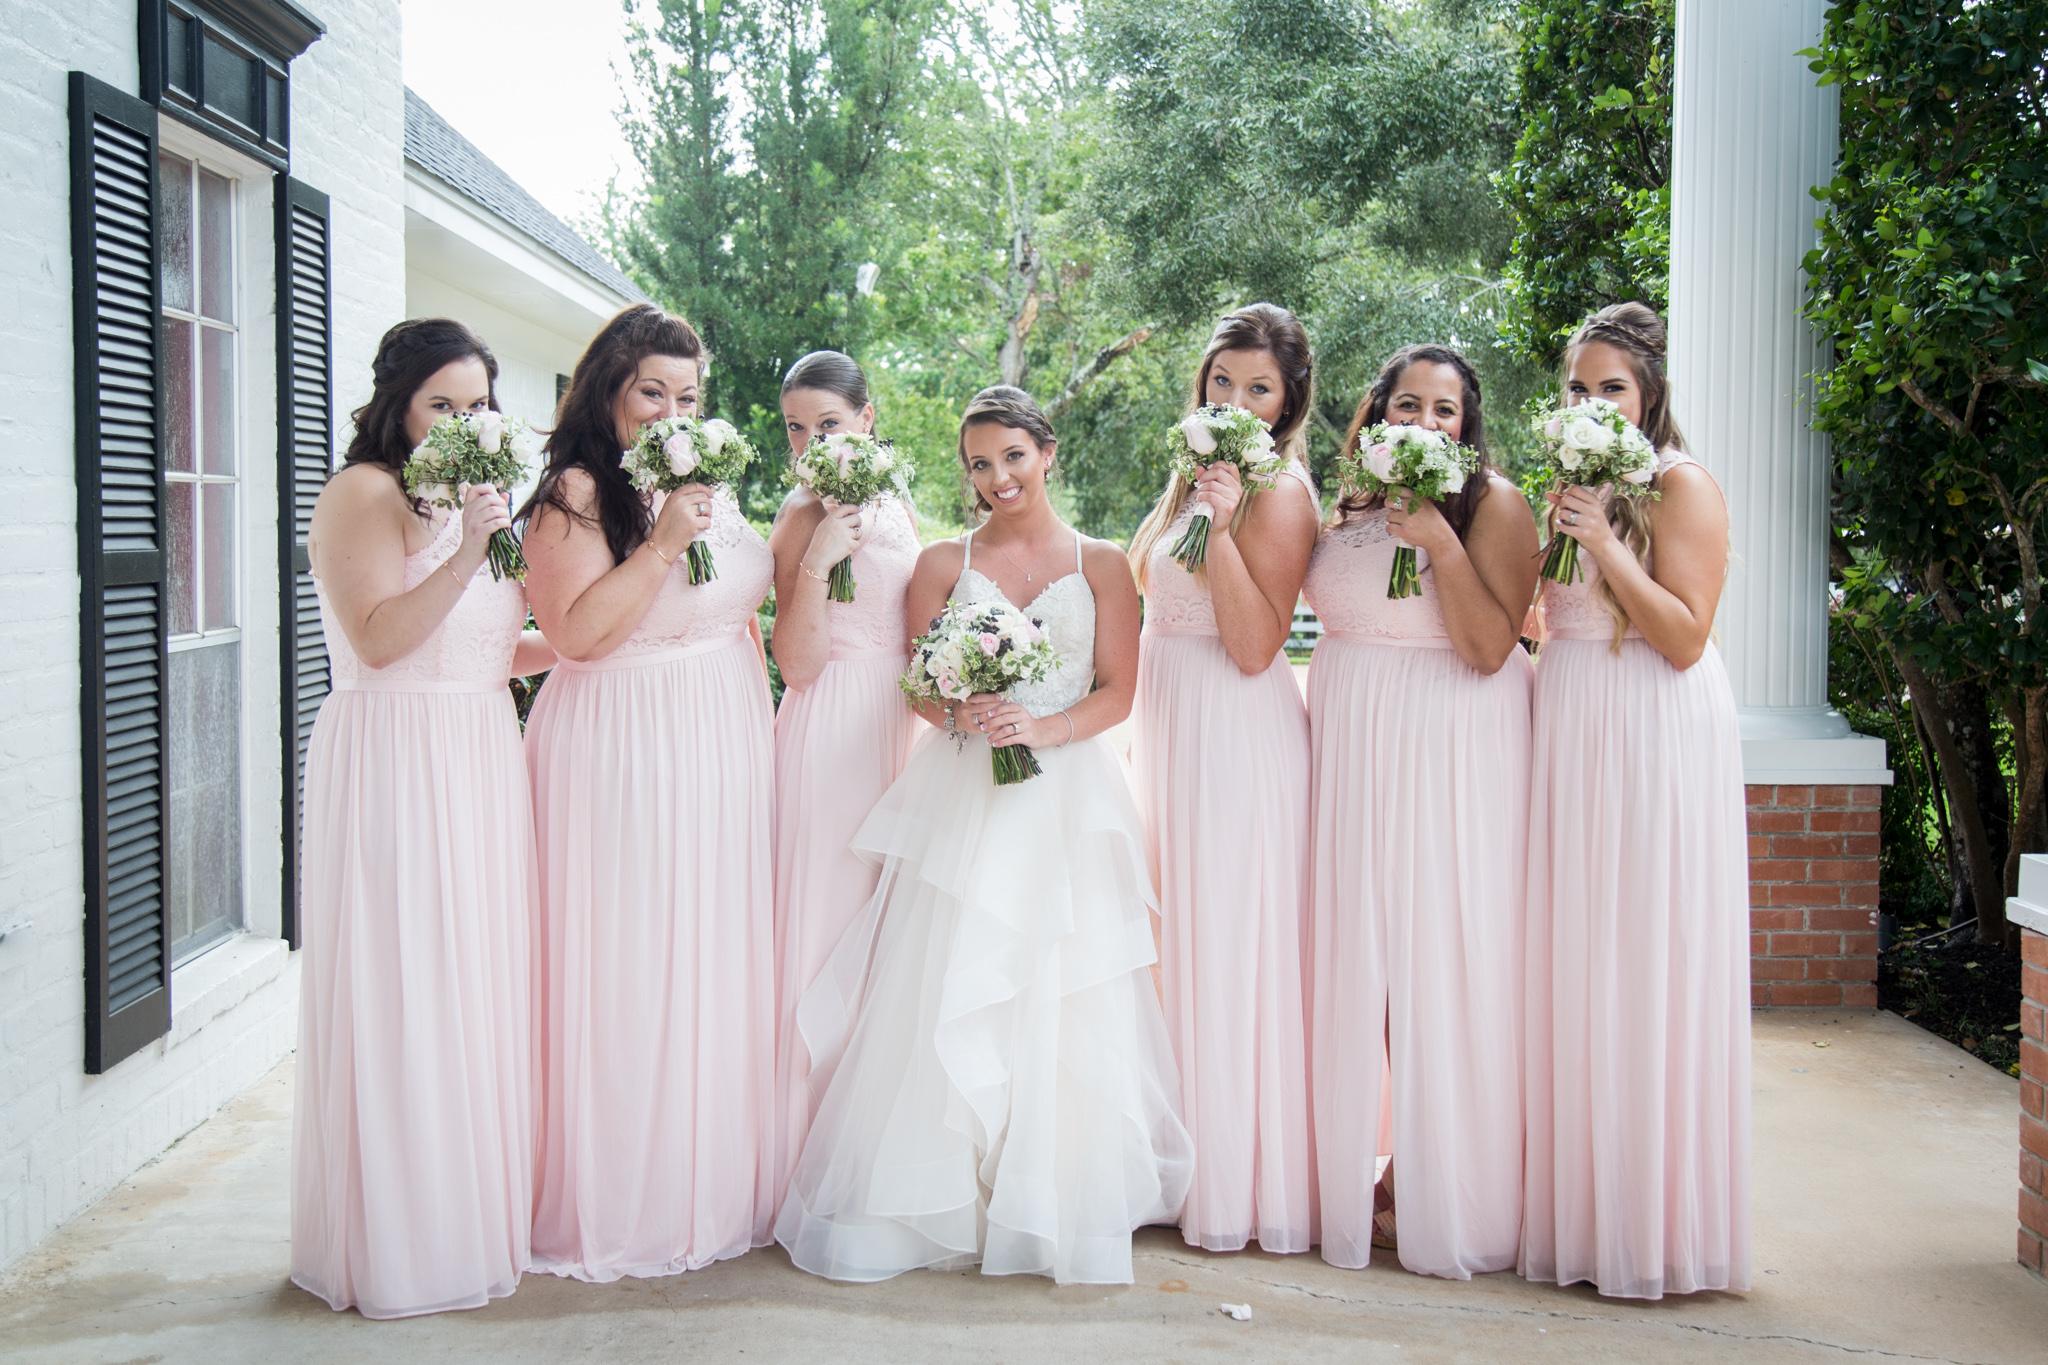 8 Manor Carport Bridal Party cover face w flowersAdrian - Keri (68)